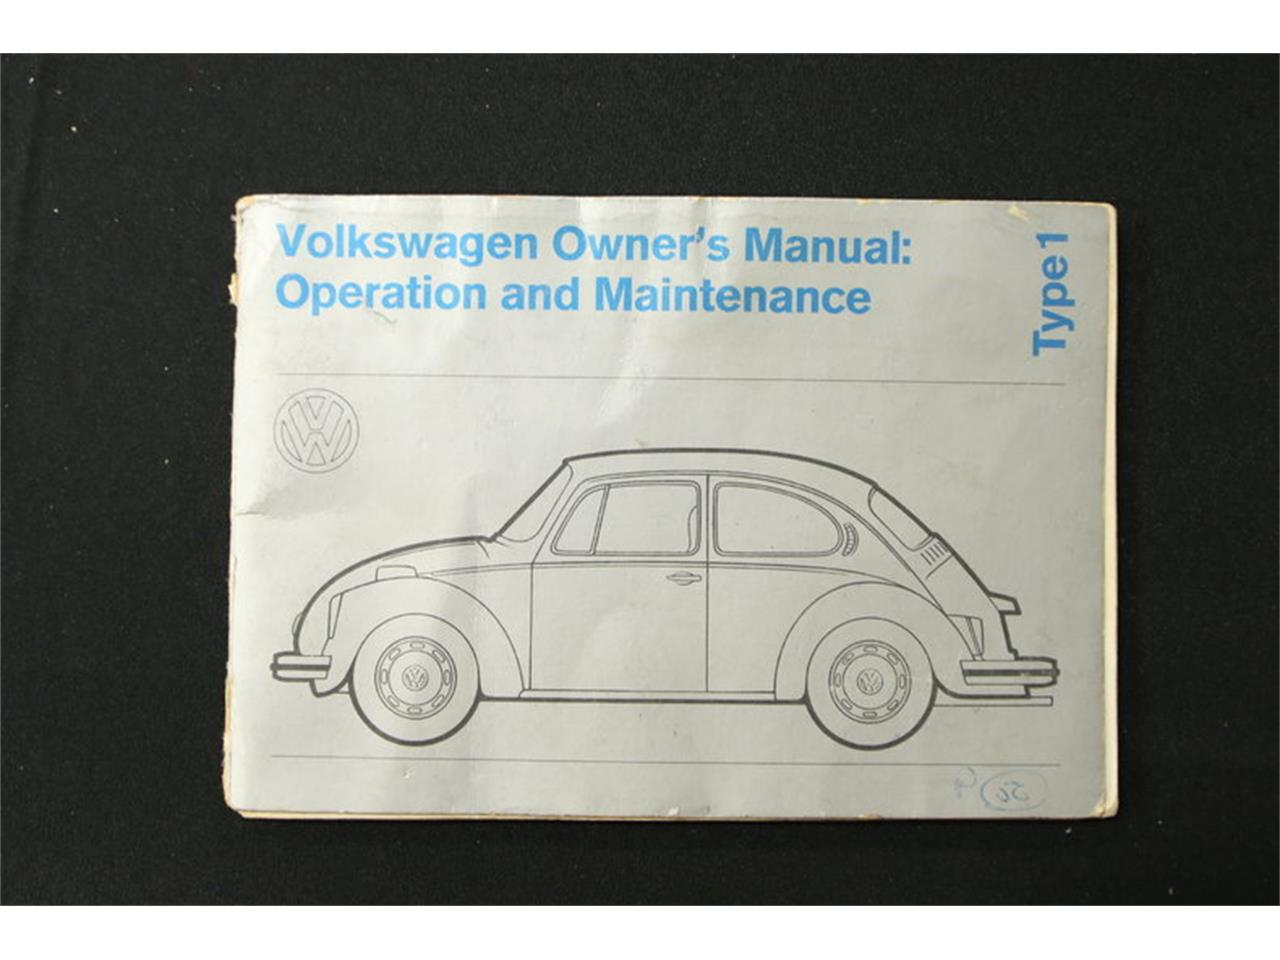 1966 vw beetle owners manual ebook array beetle repair manuals ebook rh beetle repair manuals ebook argodata us fandeluxe Images